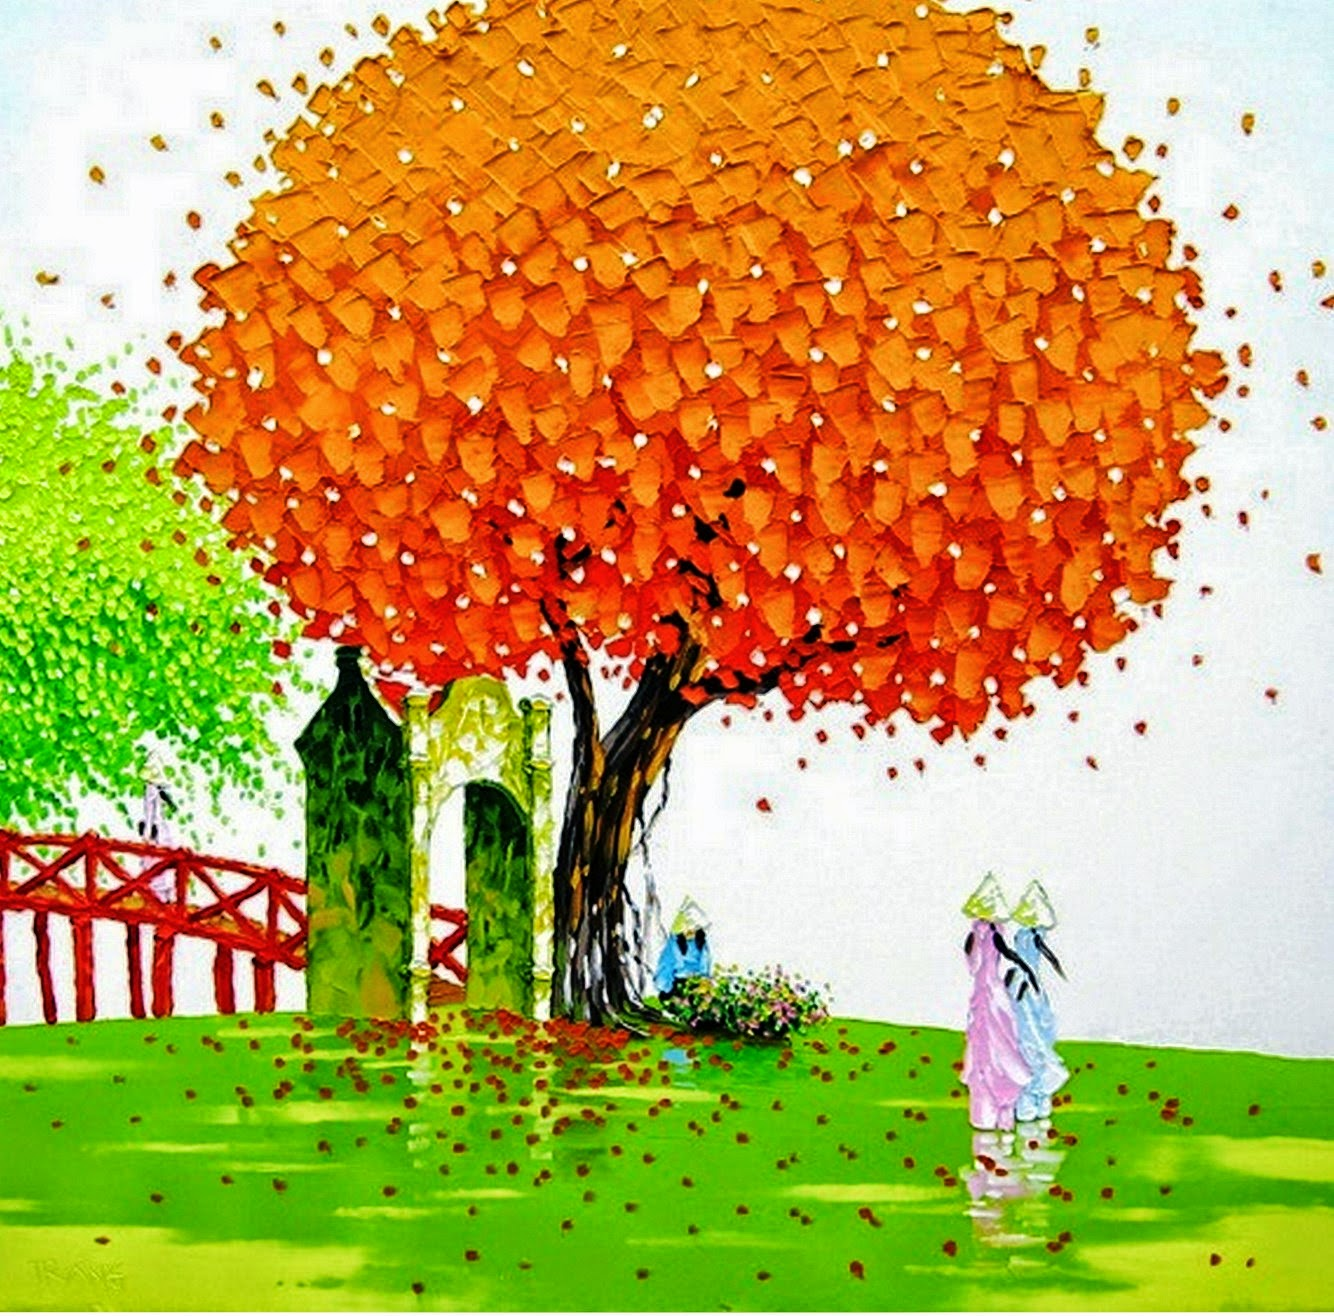 Pintura moderna y fotograf a art stica cuadros coloridos for Imagenes de cuadros abstractos con texturas